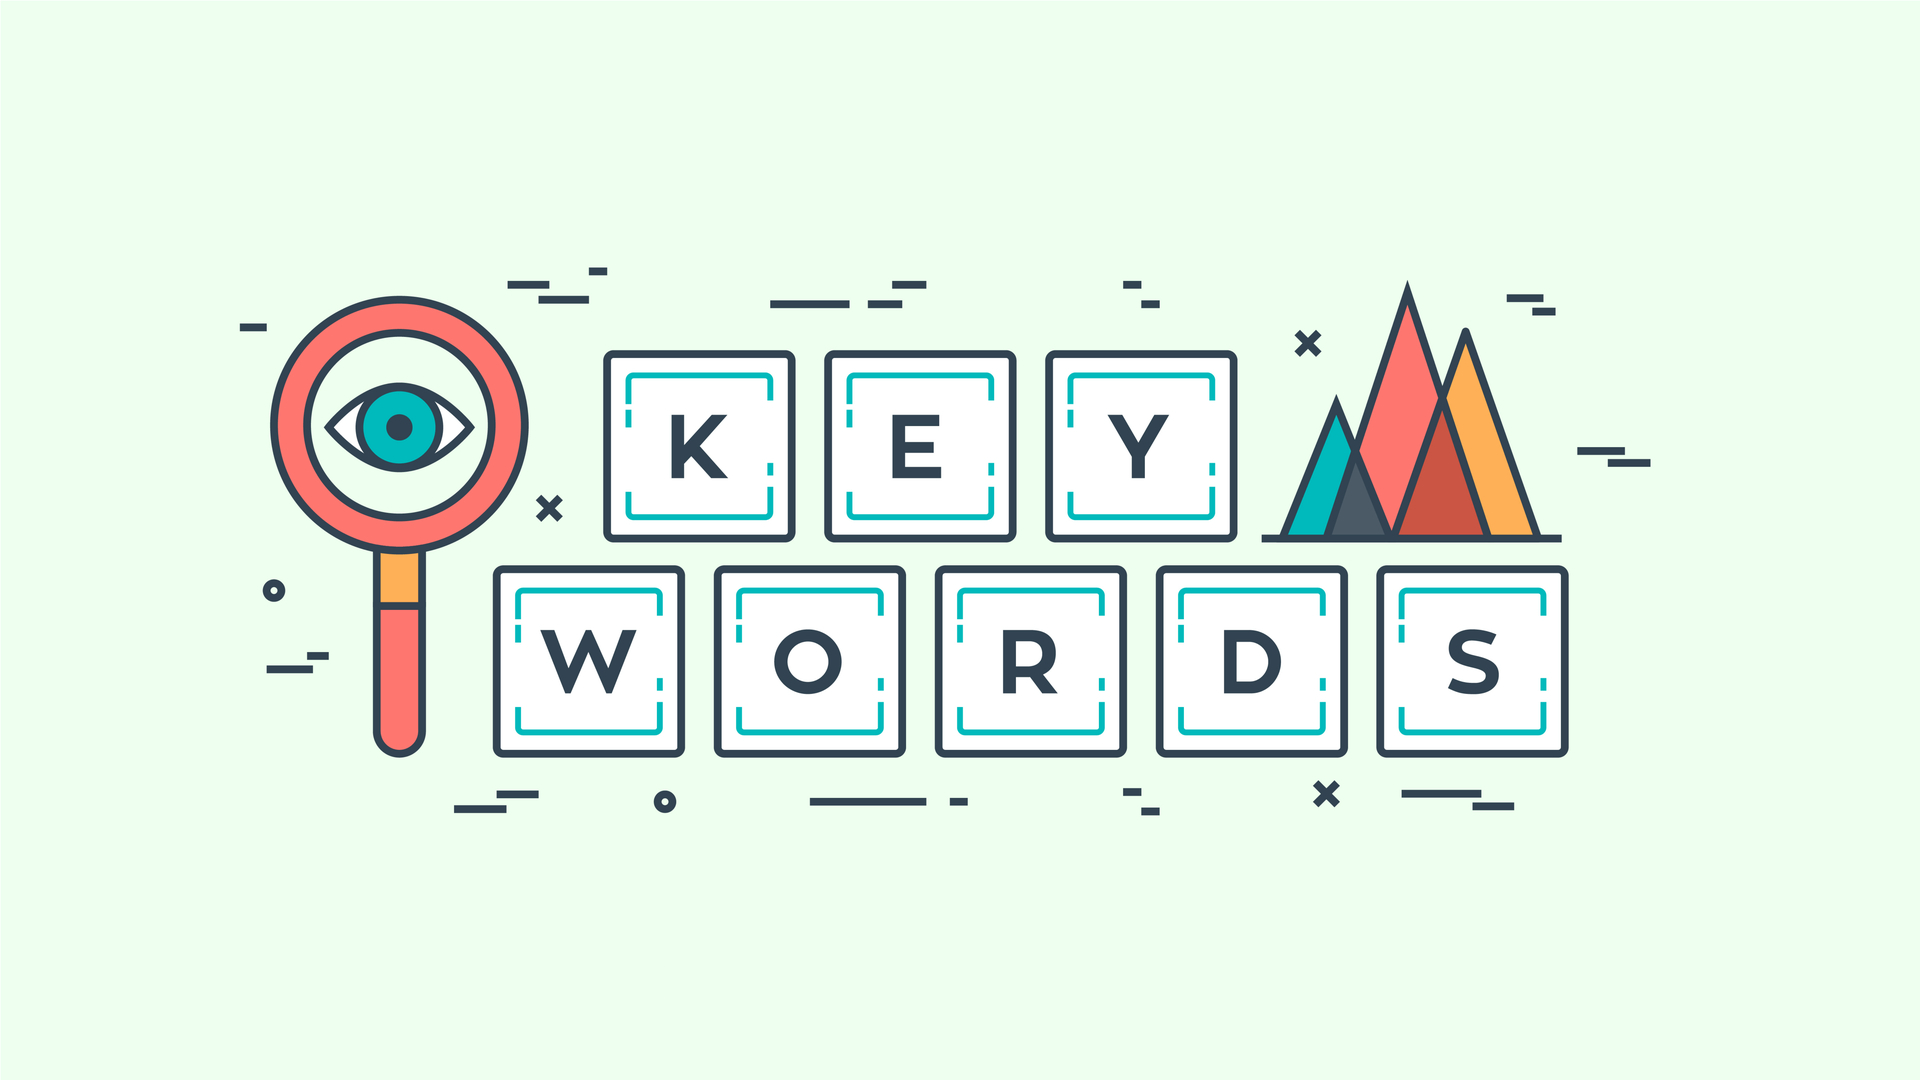 انتخاب کلمات کلیدی سئو